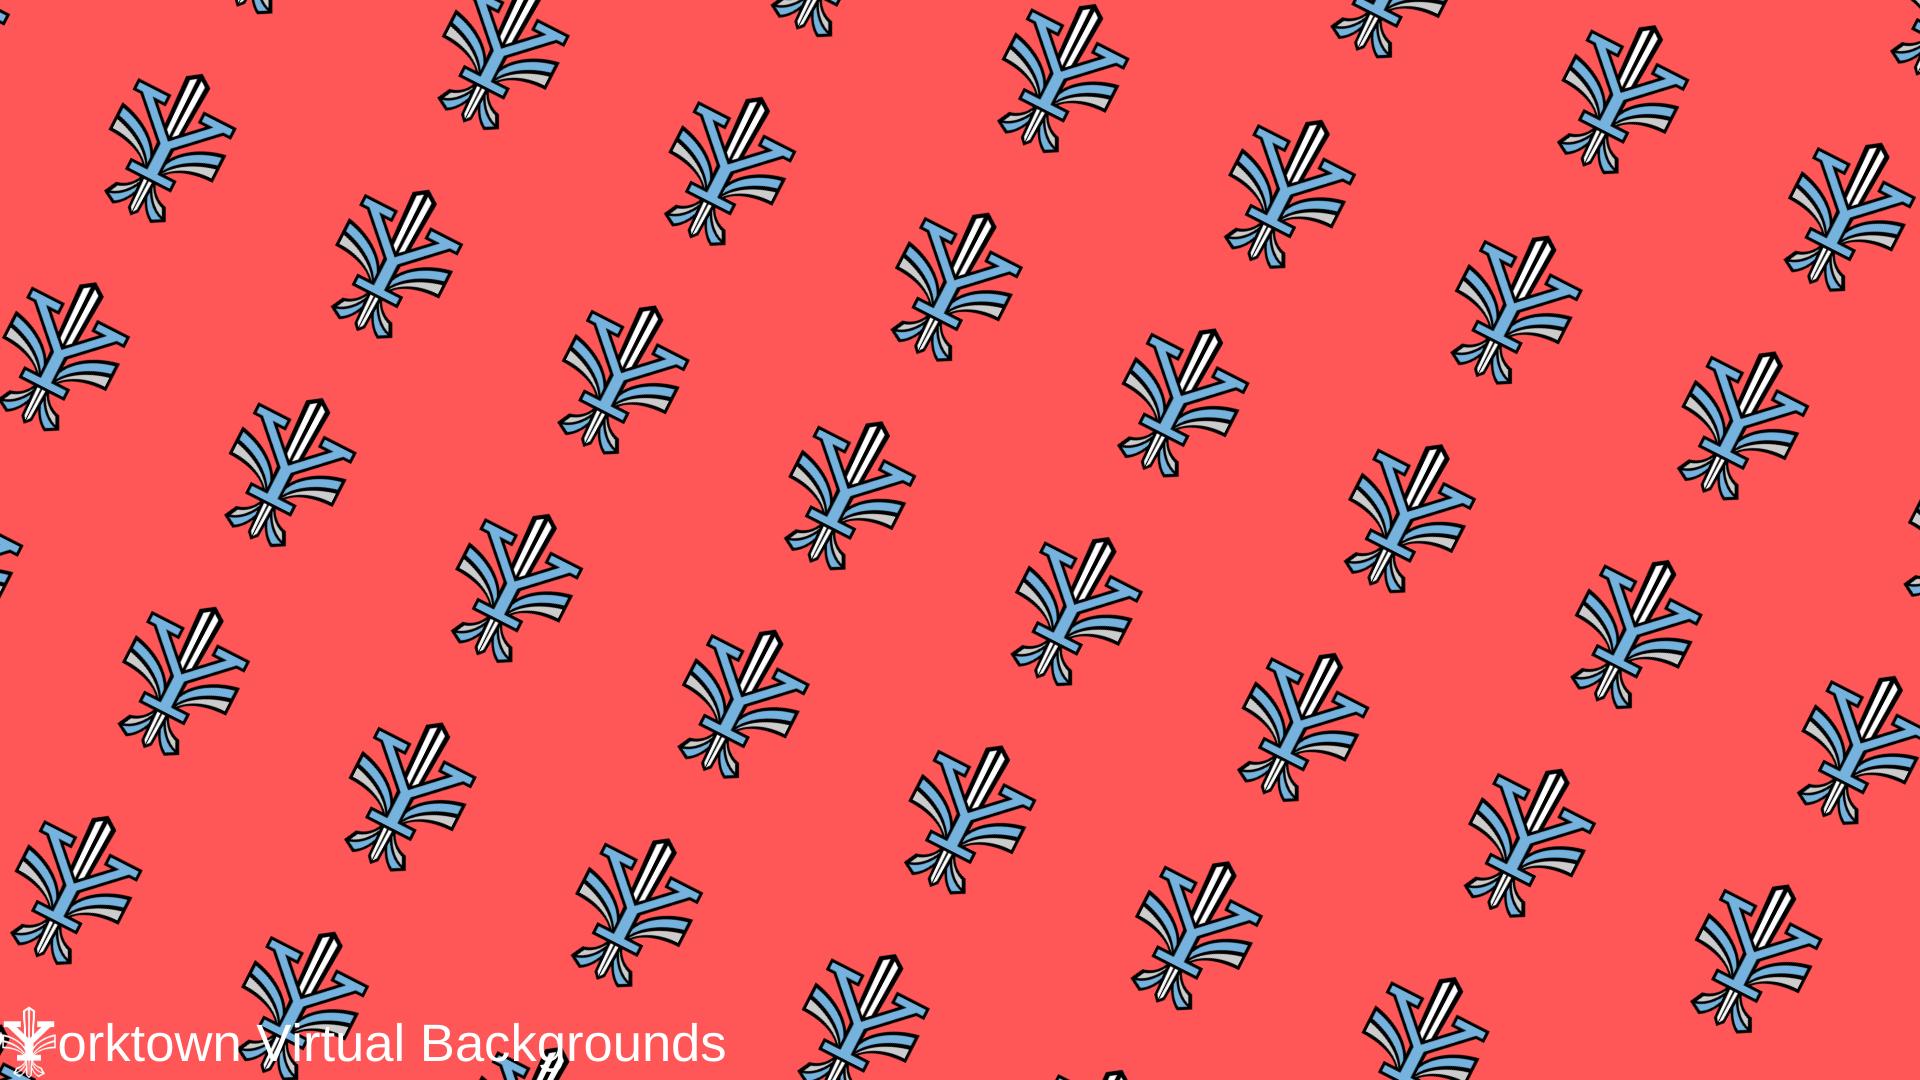 Yorktown Logo Wallpaper for Teams - Red - Diagonal